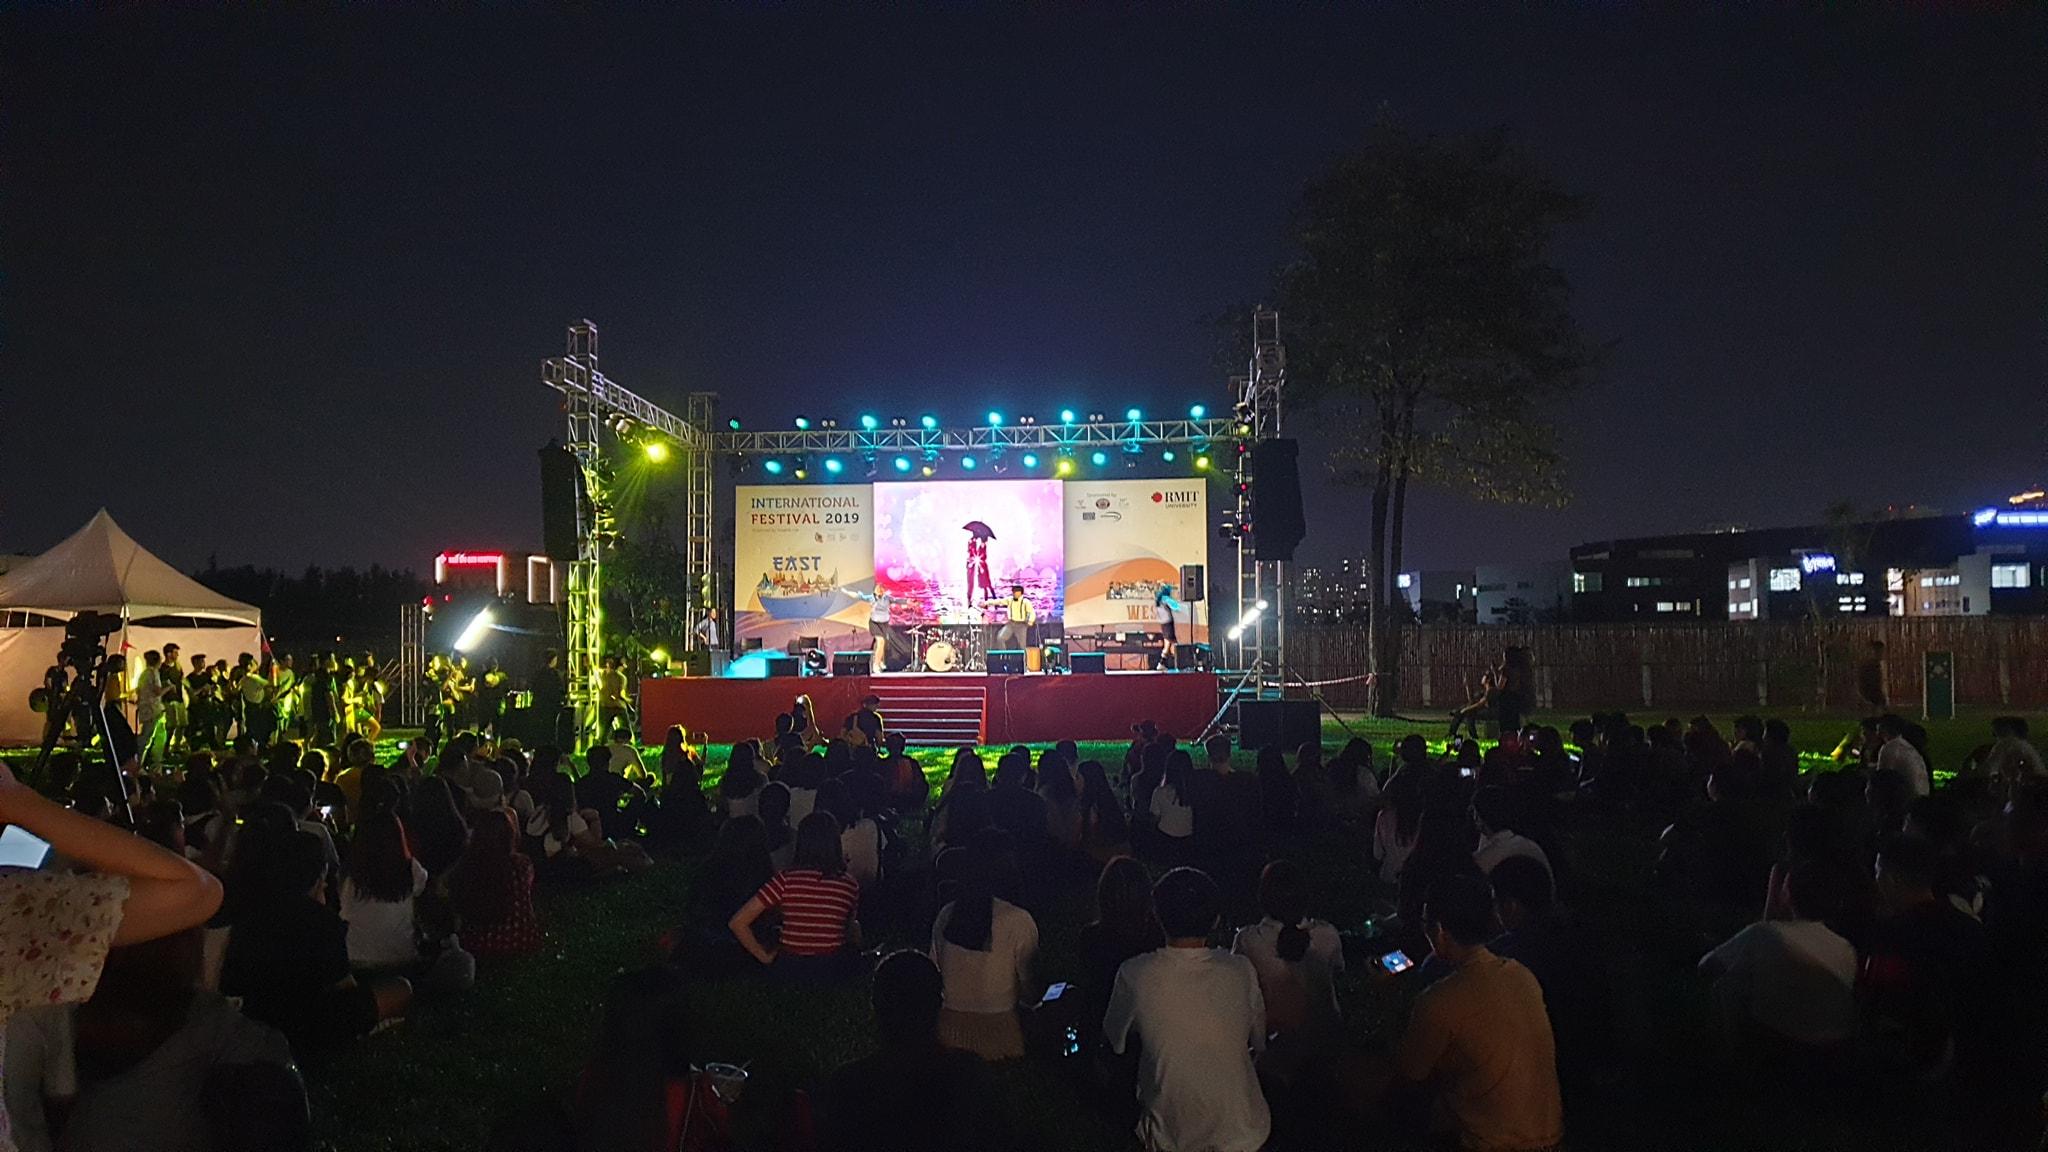 International Festival 2019